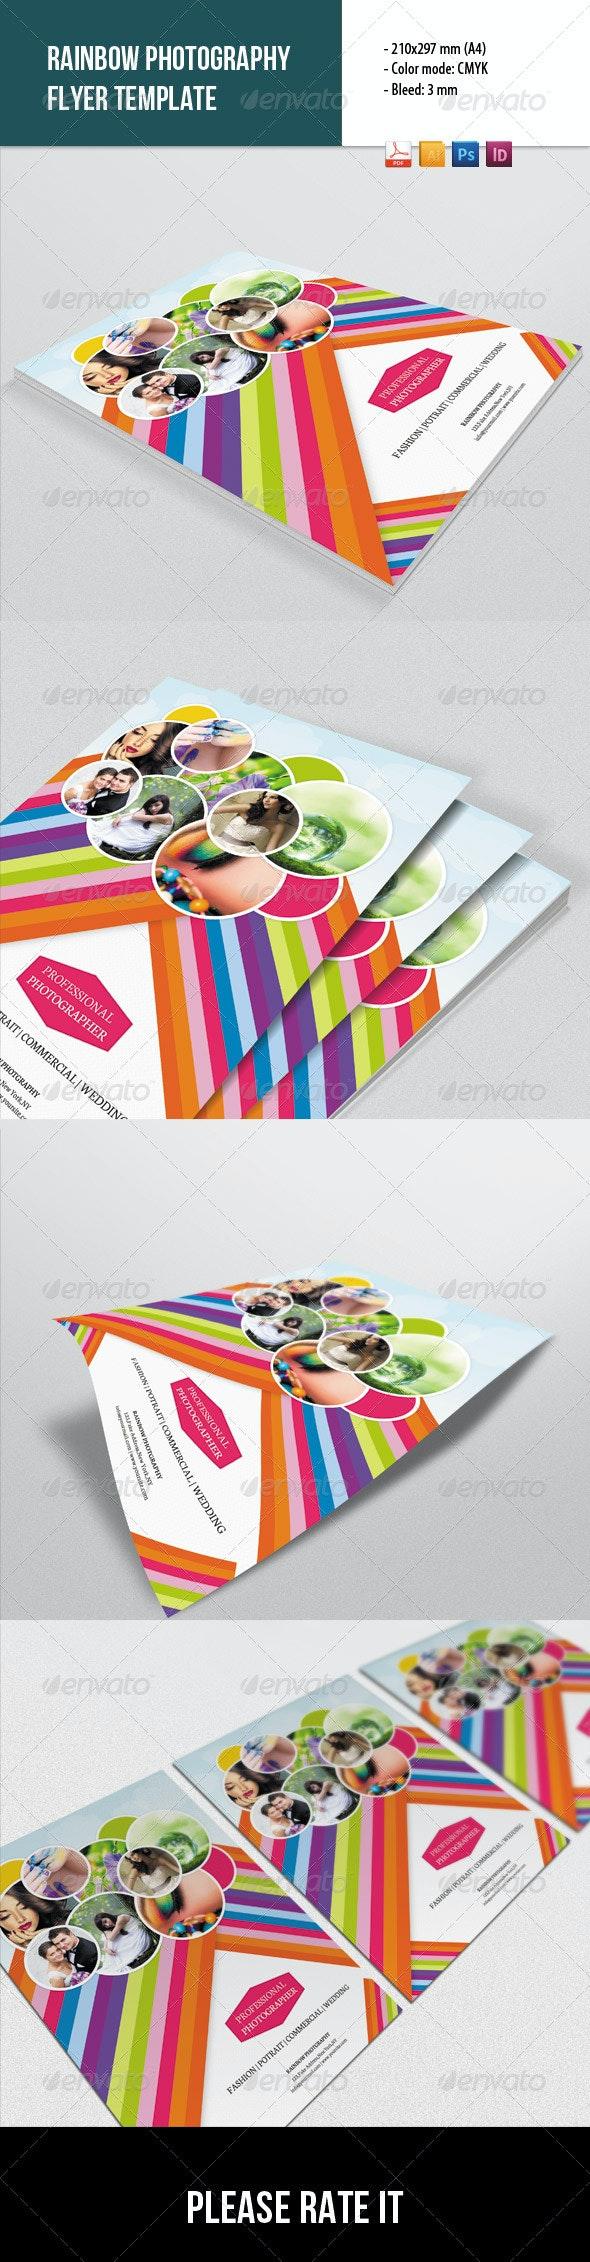 Rainbow Style Photography Flyer - Corporate Flyers